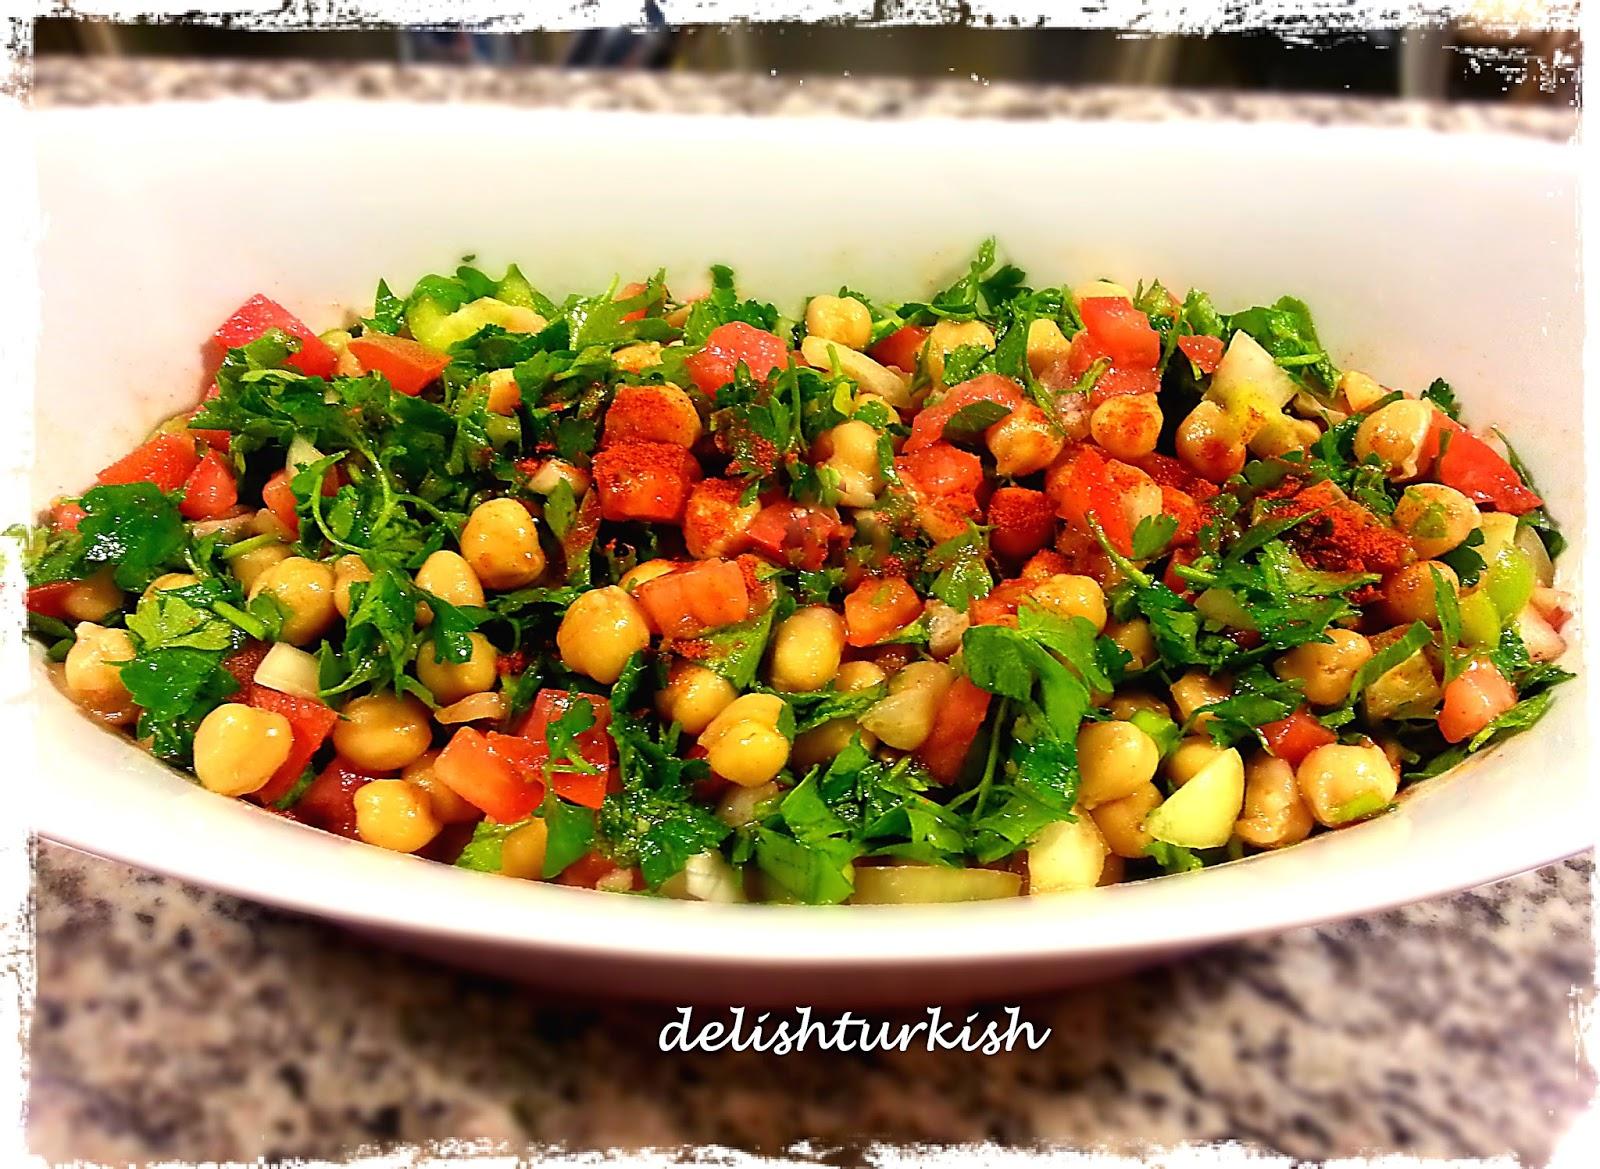 Delicious turkish food recipes chickpea salad nohut salatasi forumfinder Choice Image